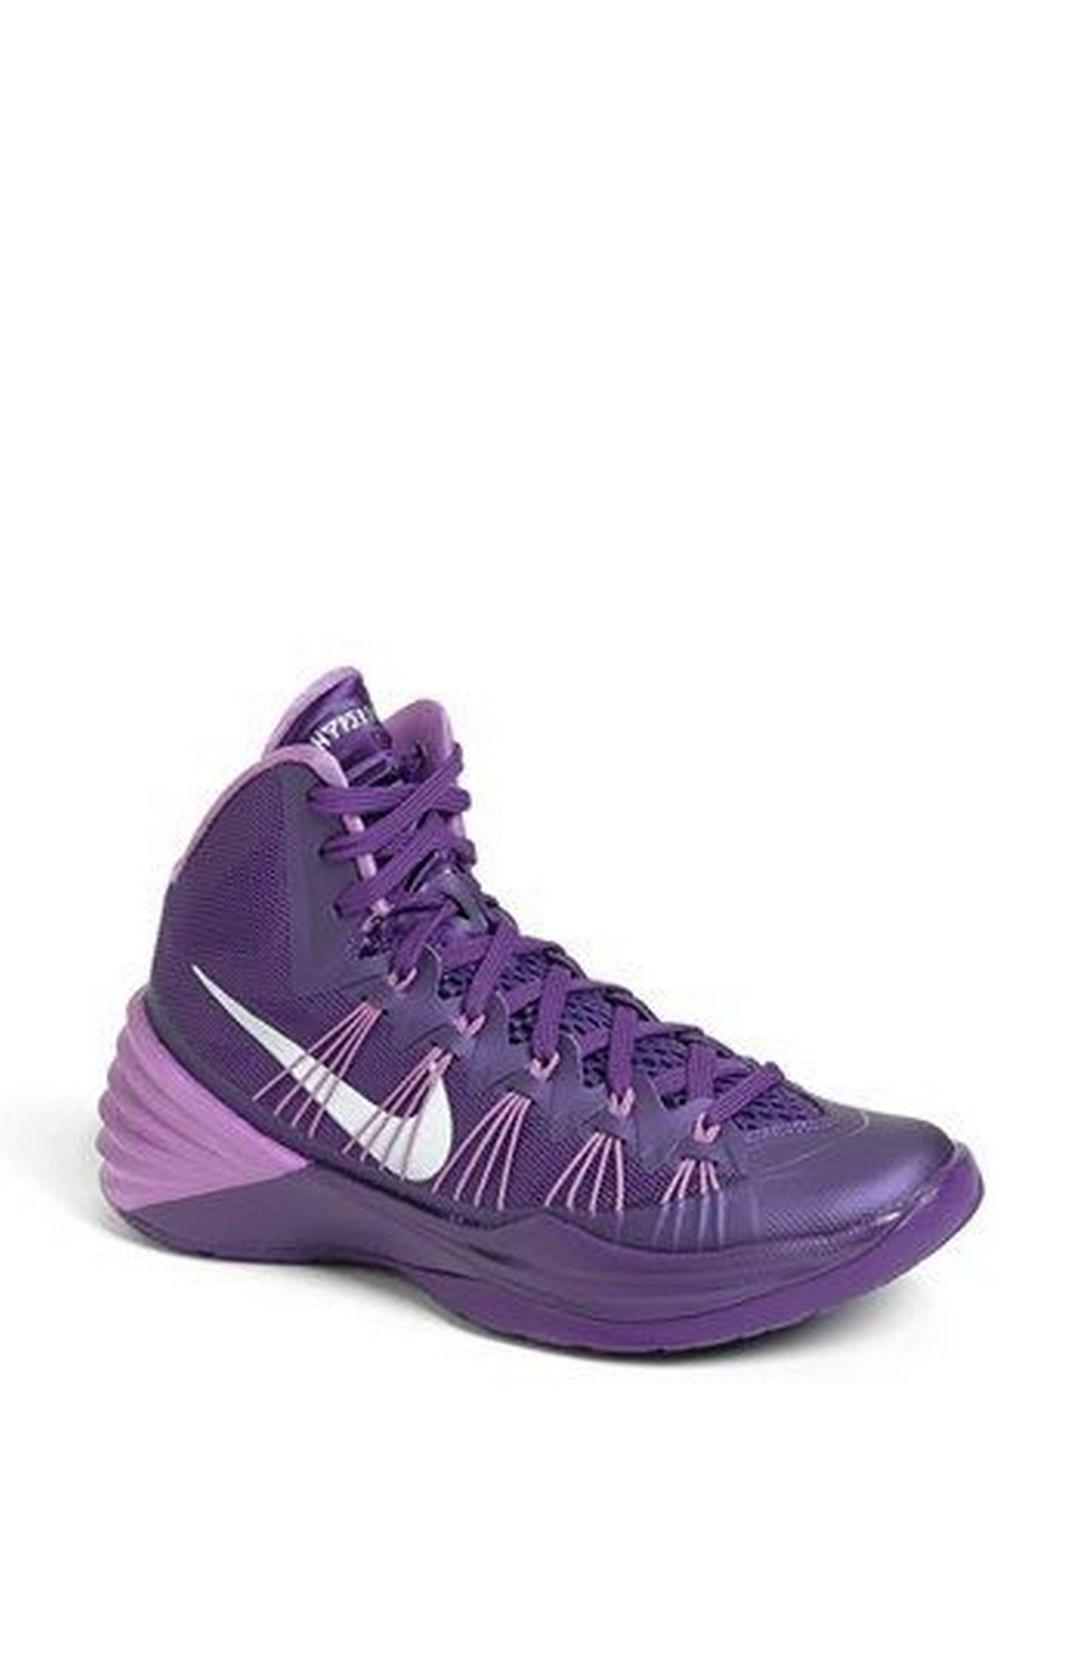 0bd6eb4fed16bf 77 Awesome Basketball Shoes Designs  https   www.designlisticle.com basketball